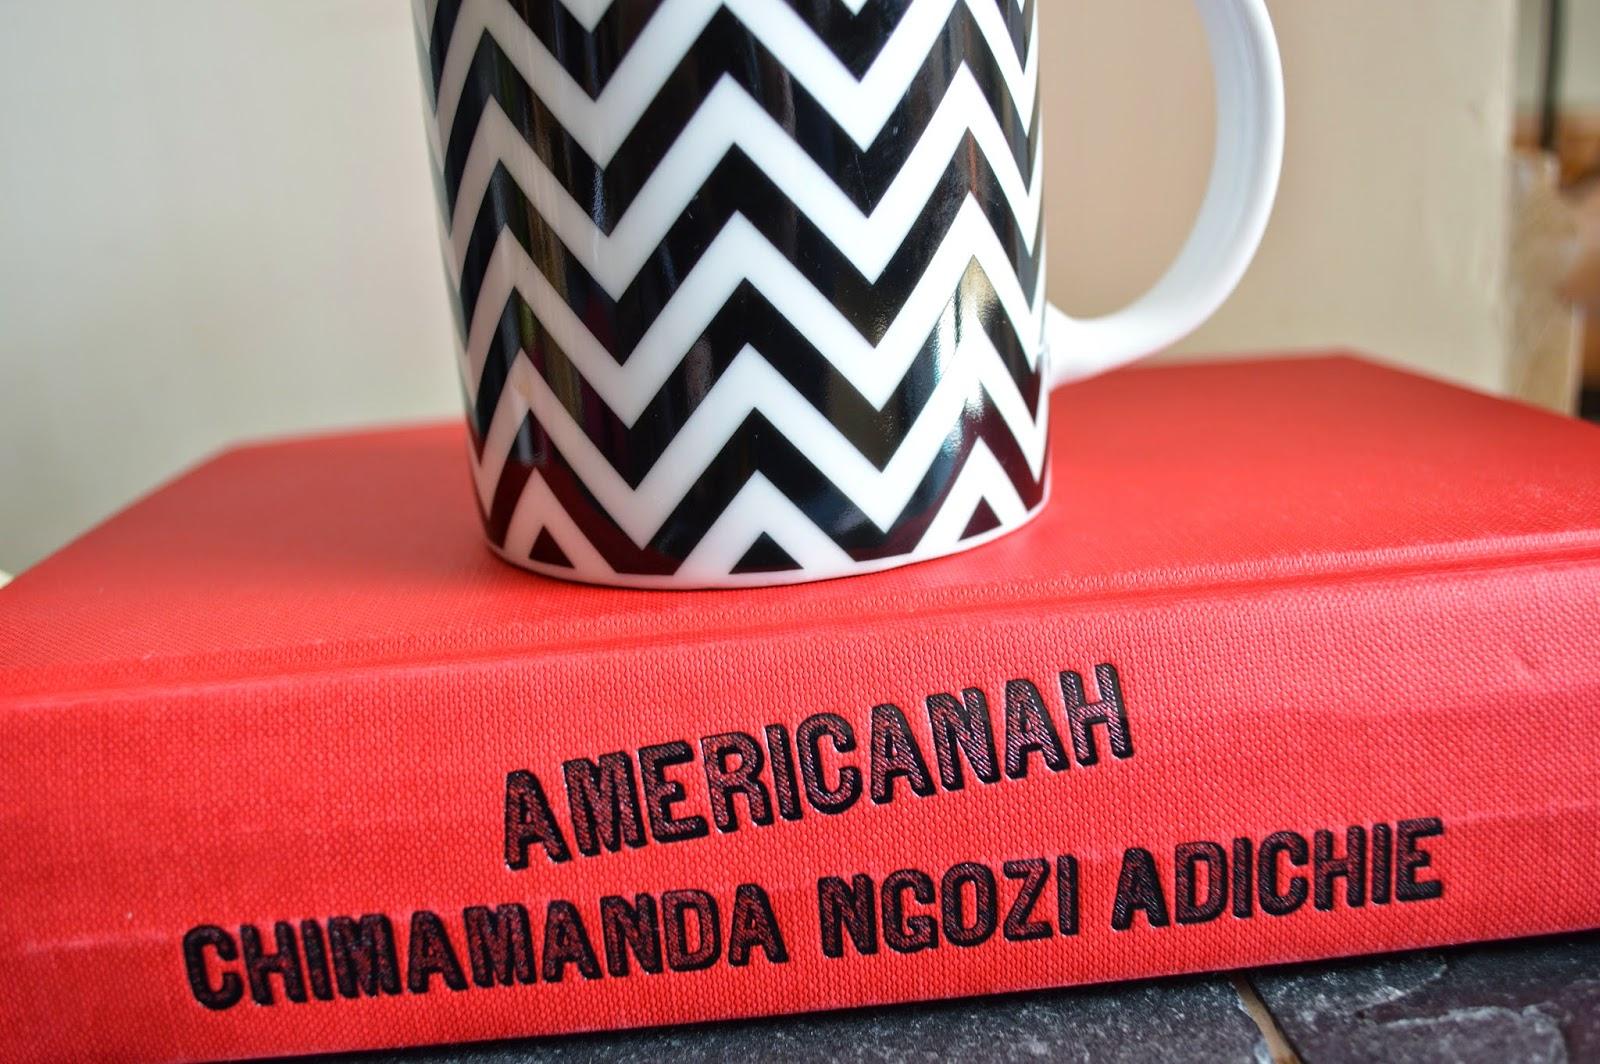 Americanah, Chimamanda Ngozi Adichie, review, book, Nigerian, literature, immigration, assimilation, Africa, America, love,